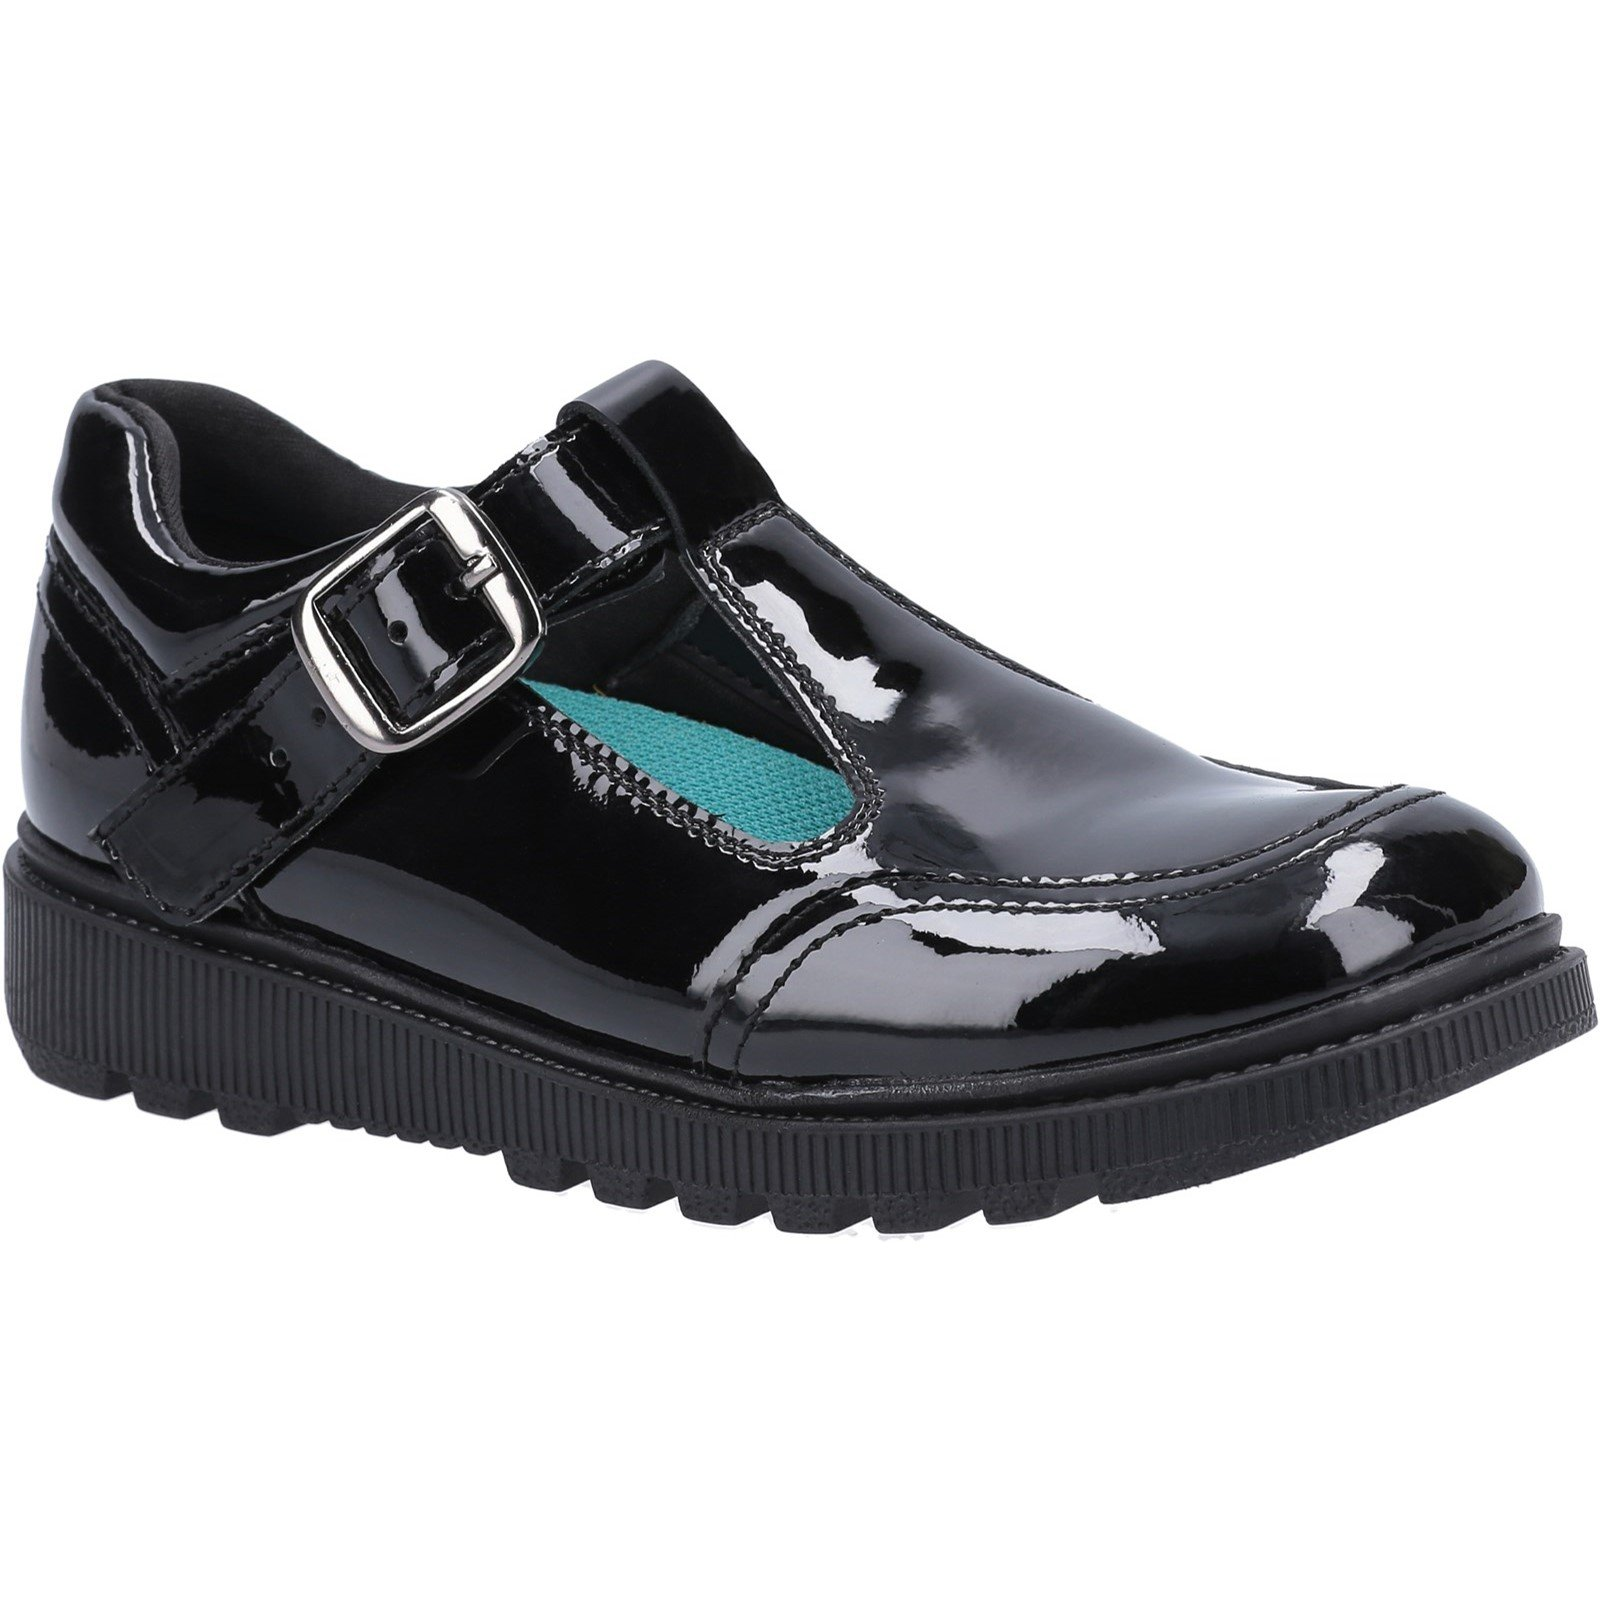 Hush Puppies Kid's Kerry Senior School Shoe Patent Black 30820 - Patent Black 5